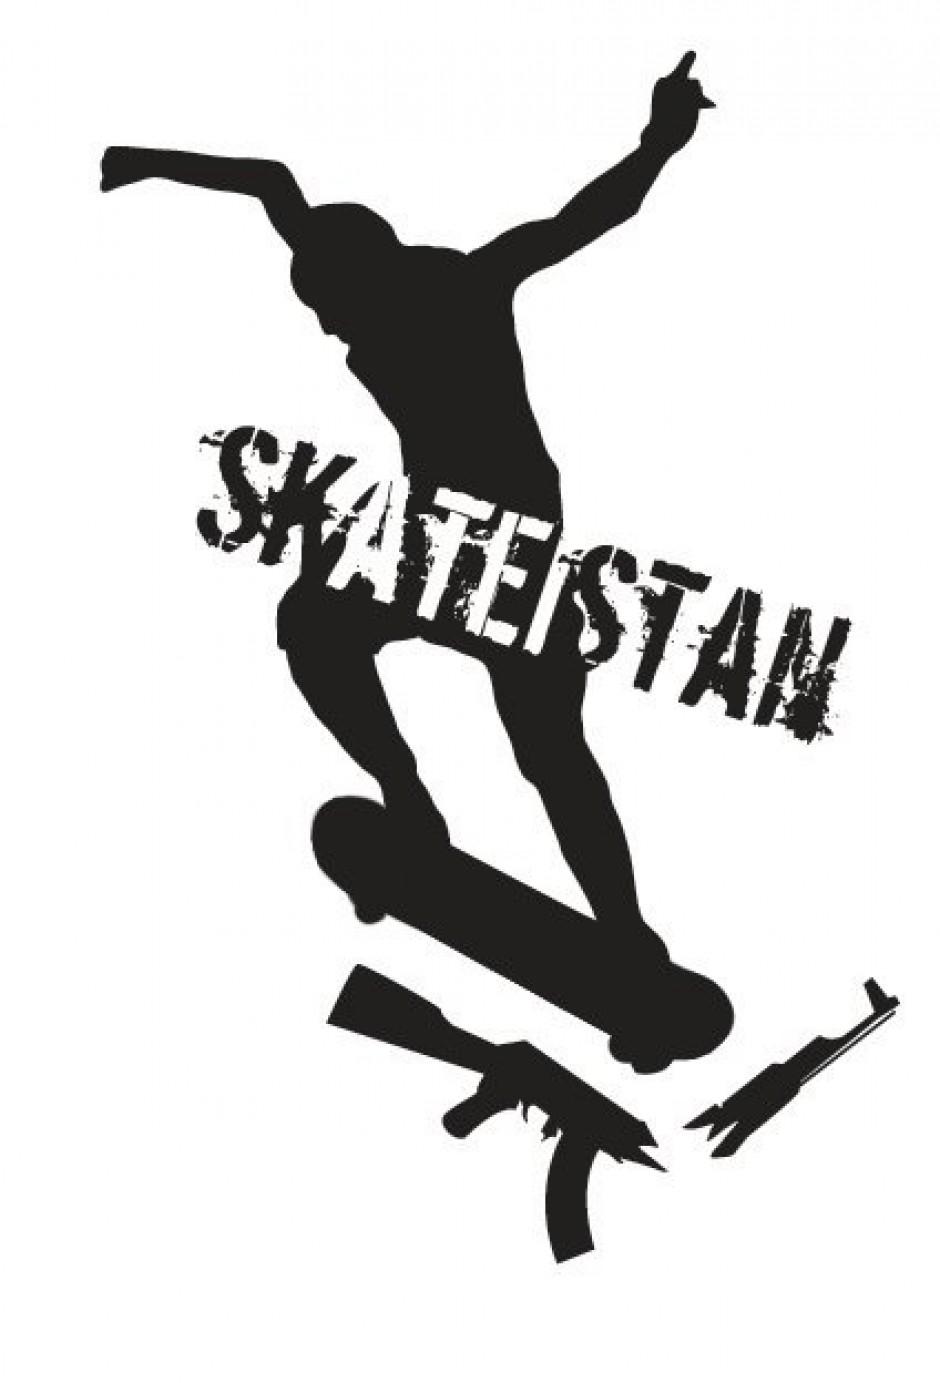 Skateistan: The Tale of Skateboarding in Afghanistan!